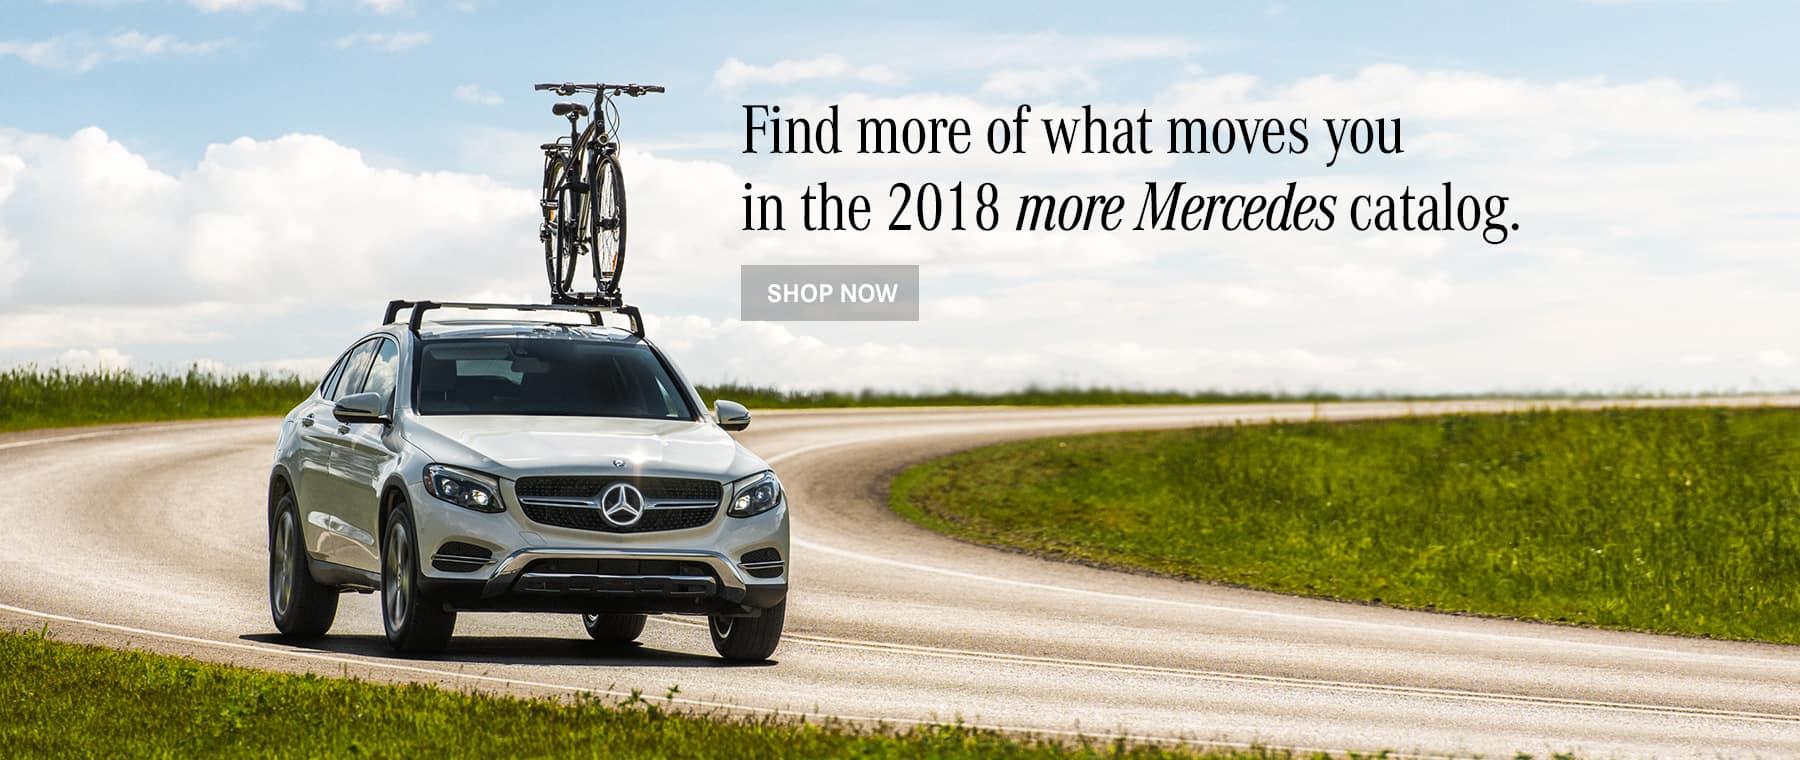 2018 Mercedes-Benz Catalog Banner